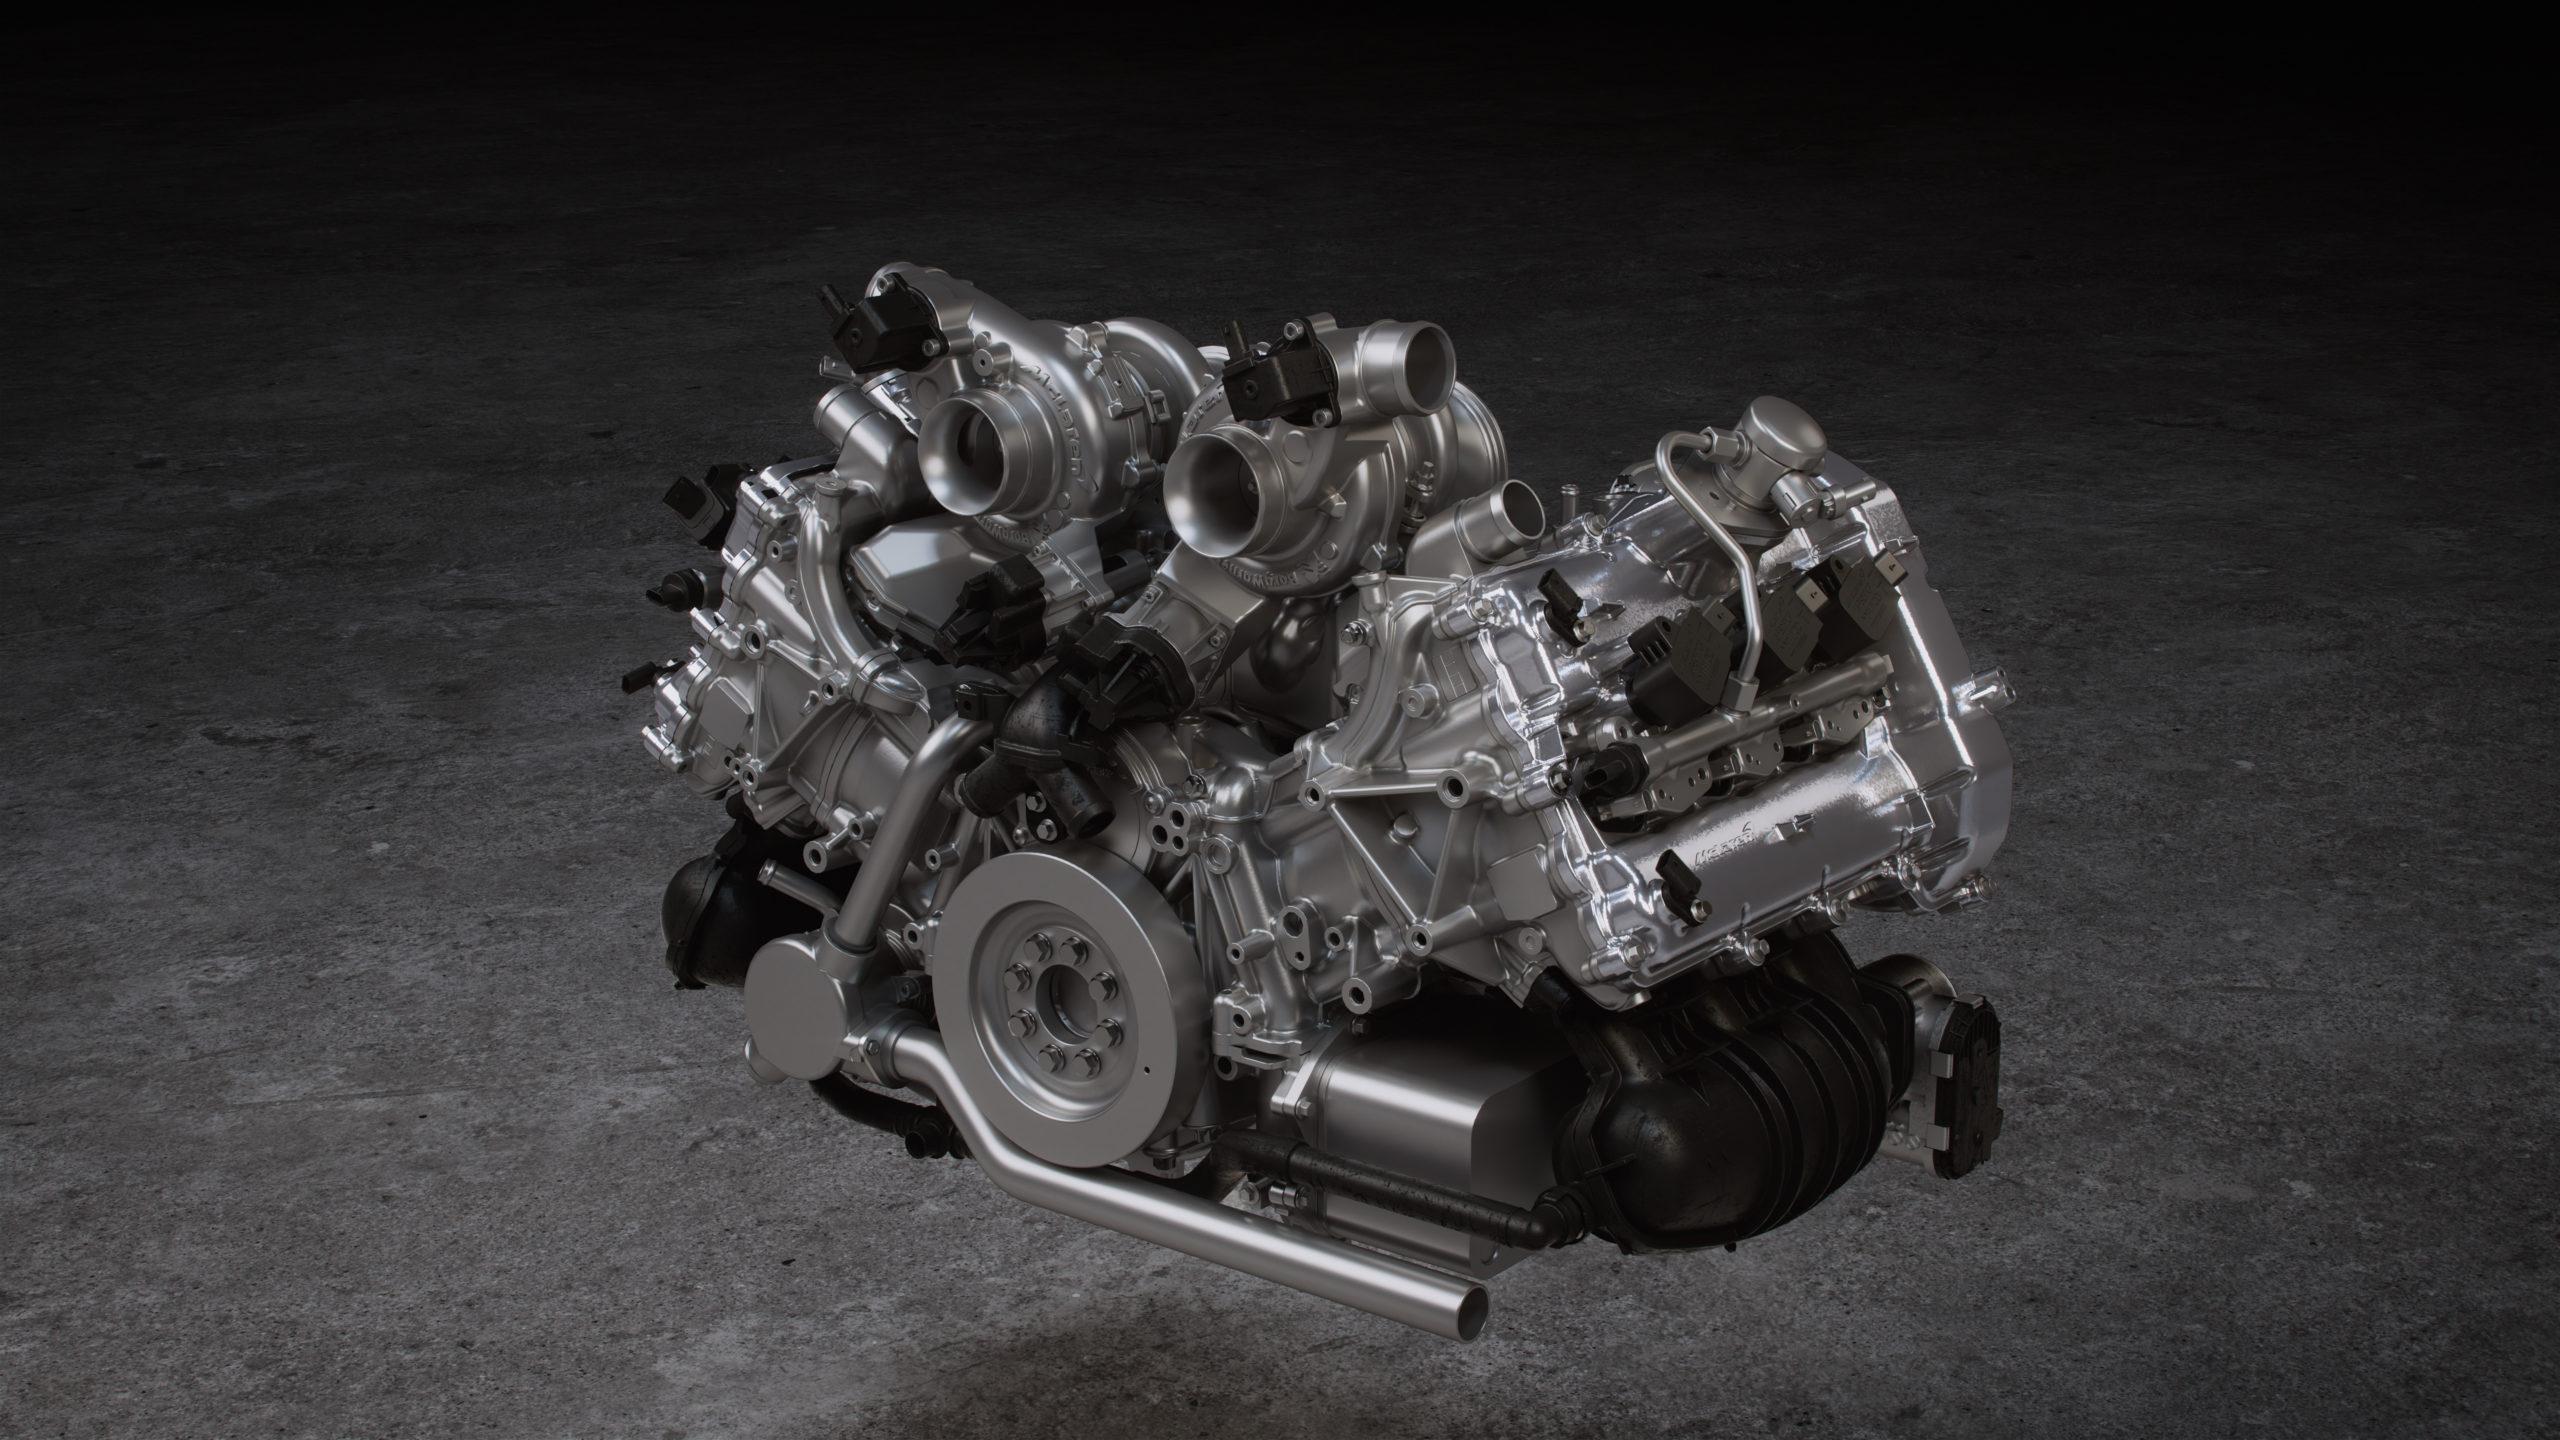 2022 McLaren Artura twin-turbo V6